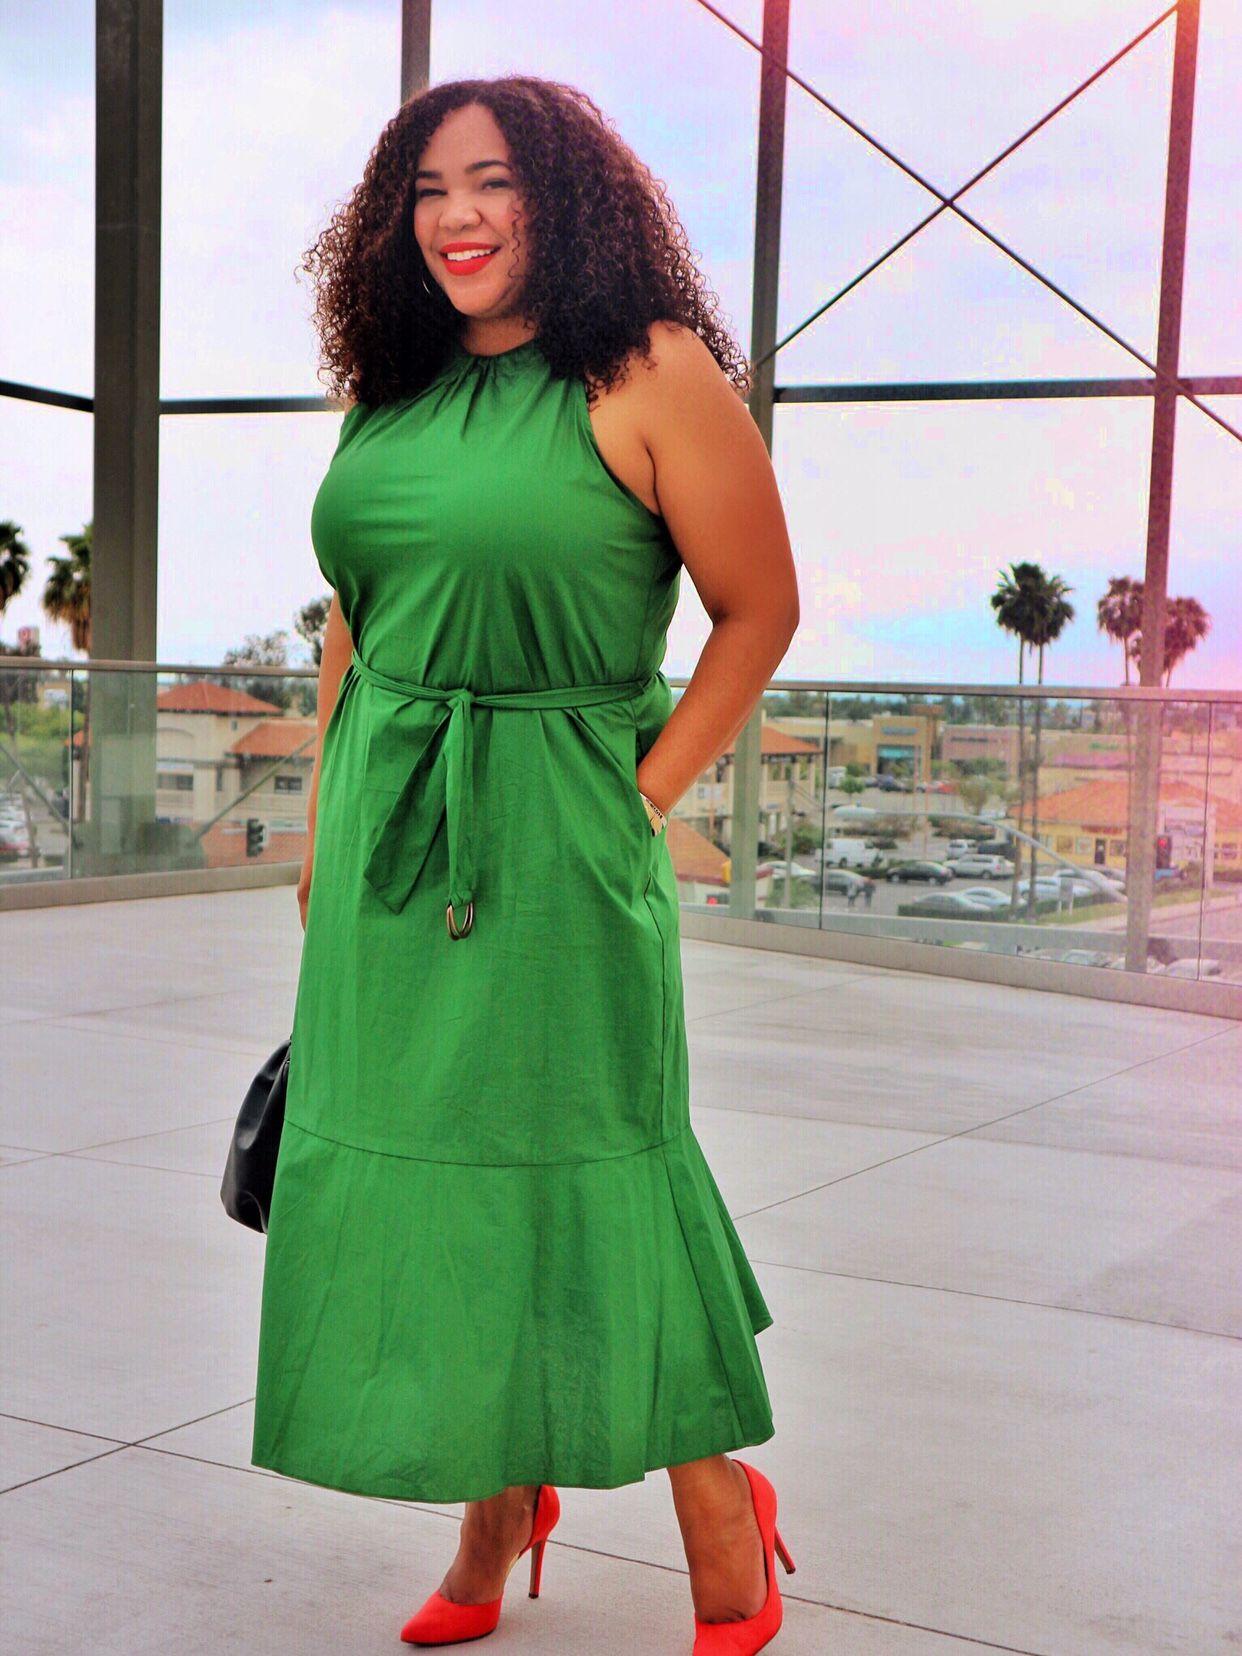 A High Neck Midi Green Dress Liv By Viv Green Midi Dress Green Dress Dresses [ 1656 x 1242 Pixel ]